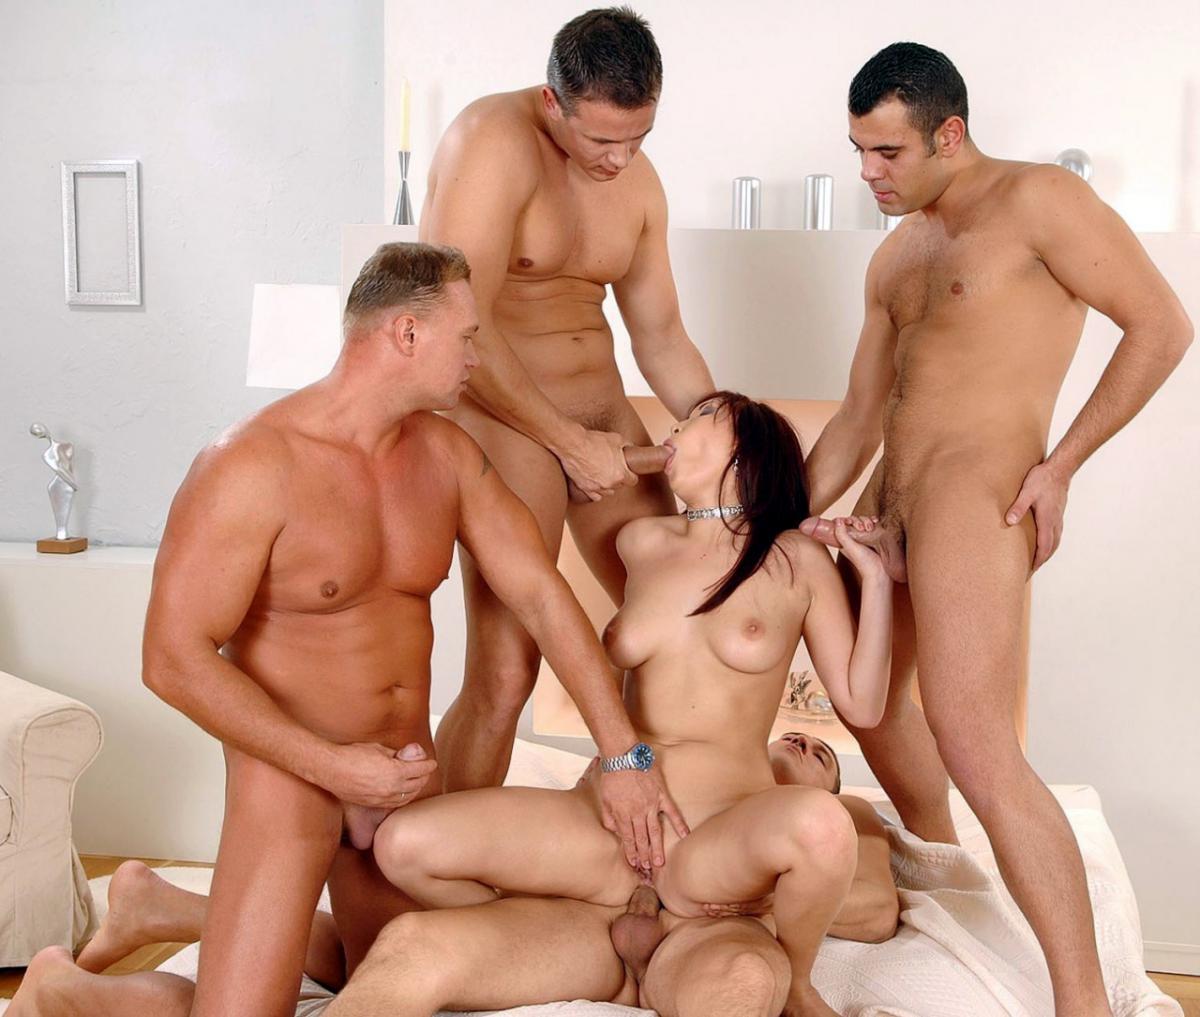 Minh recommends Hot naked korean men